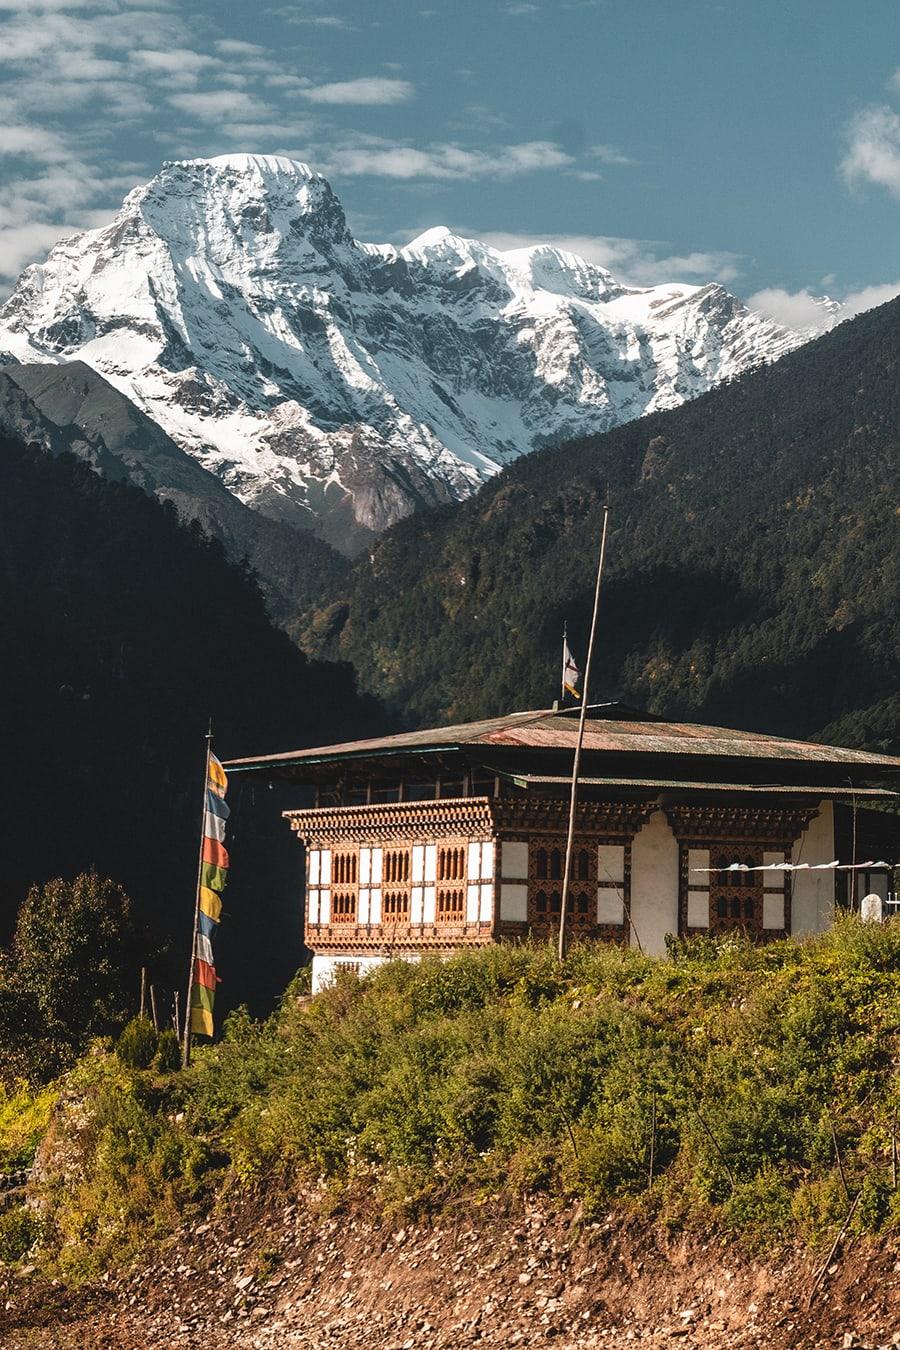 View of Kang Bum mountain (21,320 feet or 6500 meters) from Gasa, Bhutan.